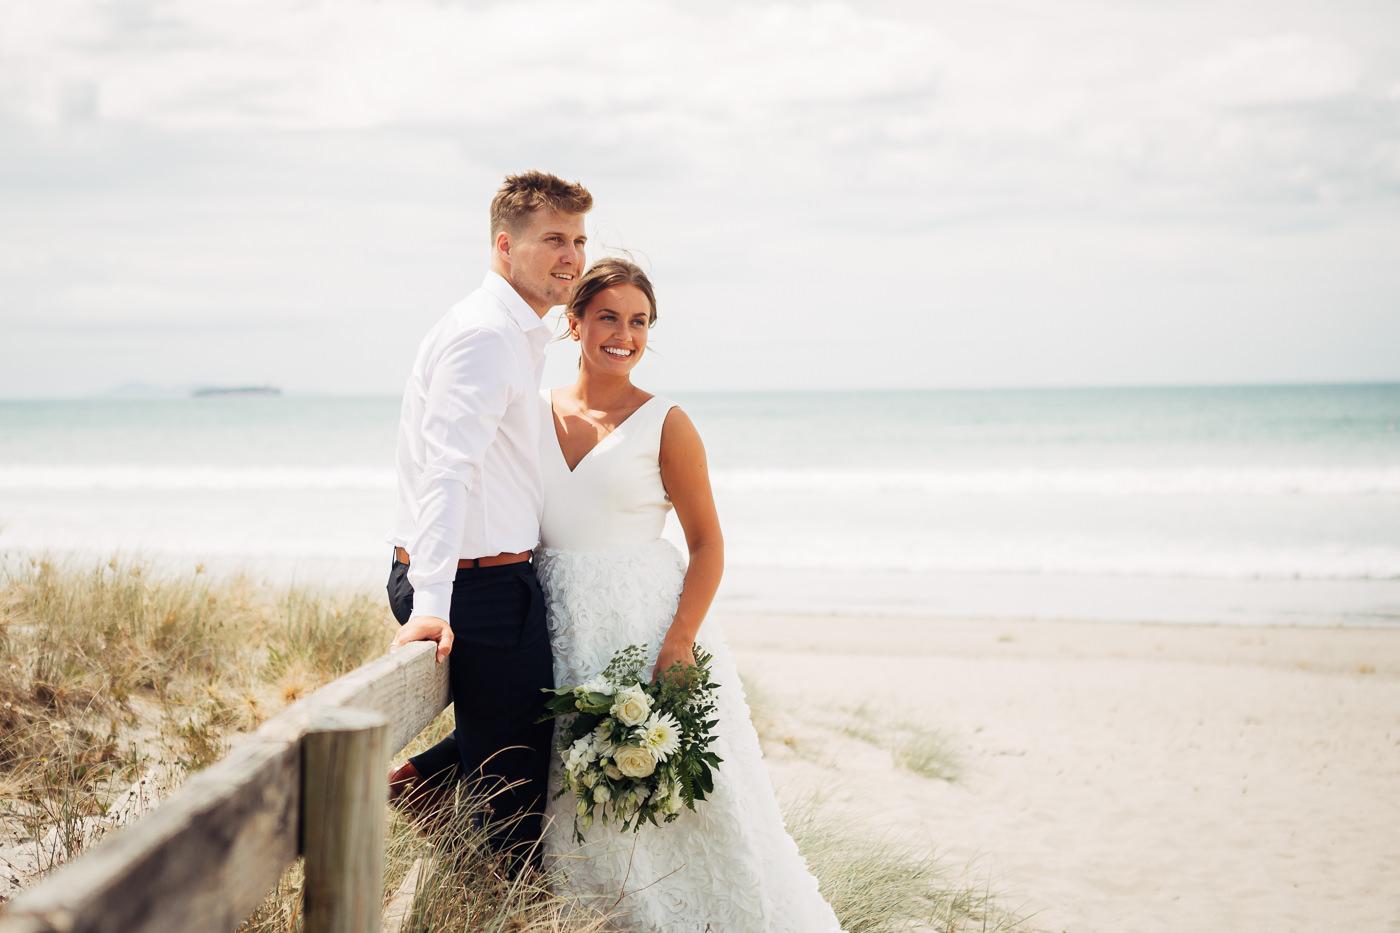 Anne-Hilde & Pieter - januarbryllup i slående vakre Tauranga, New Zealand Bryllupsfotograf New Zealand strand 12 Brudepar